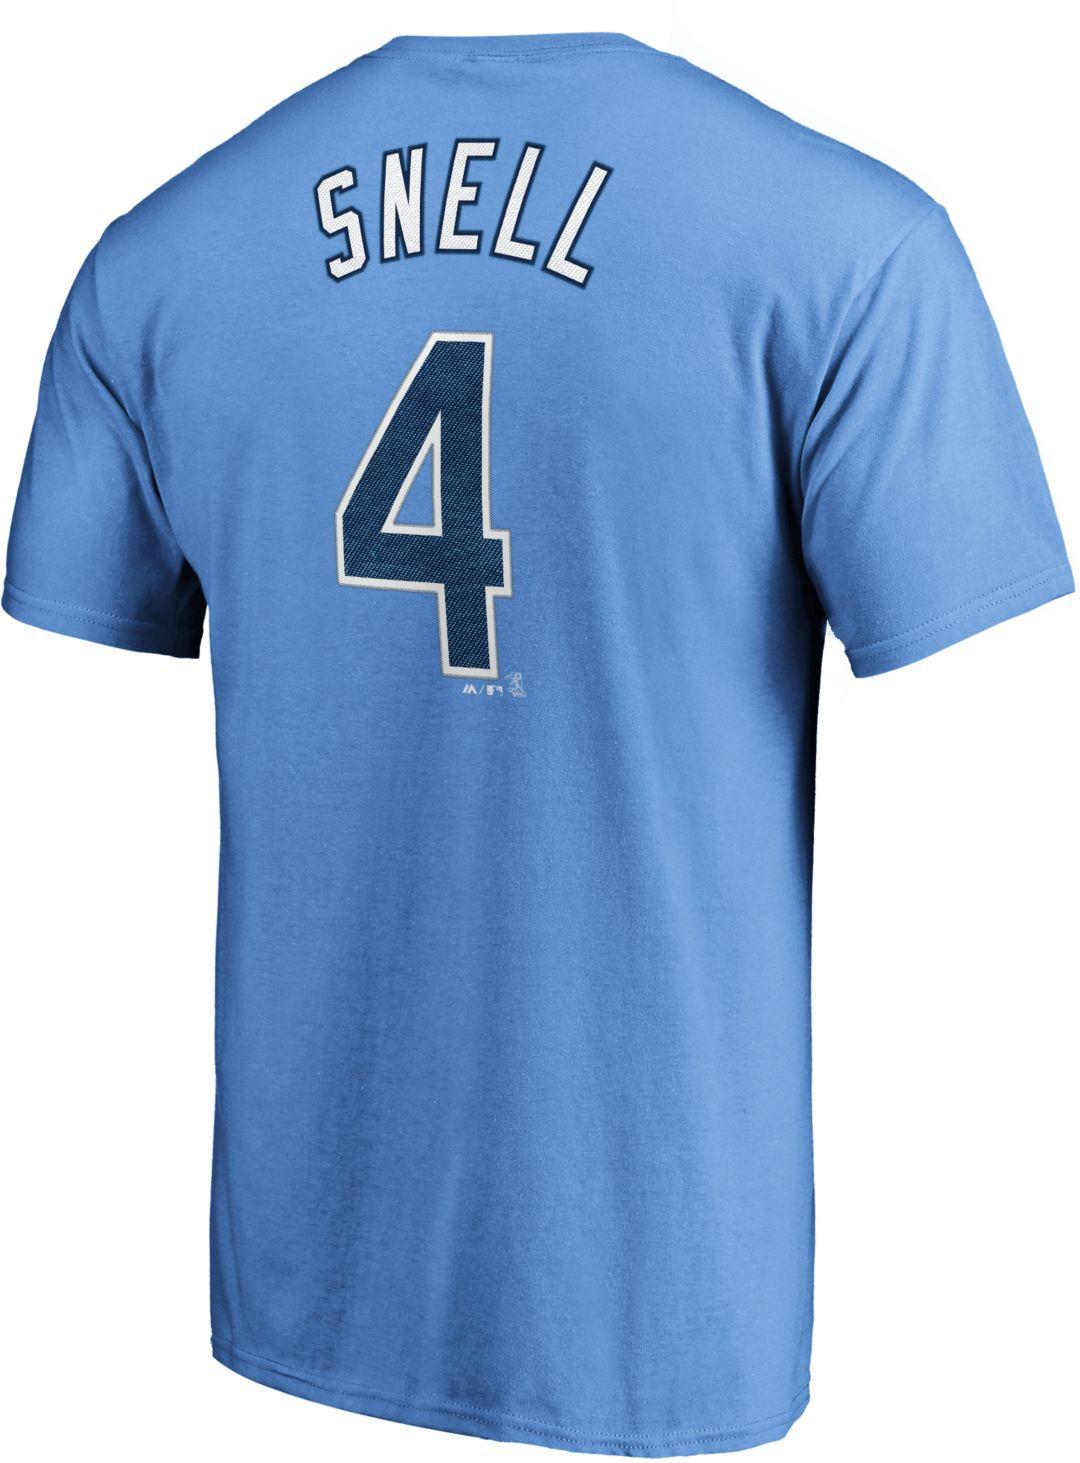 3f326bc36b Majestic Men's Tampa Bay Rays Blake Snell #4 Light Blue T-Shirt